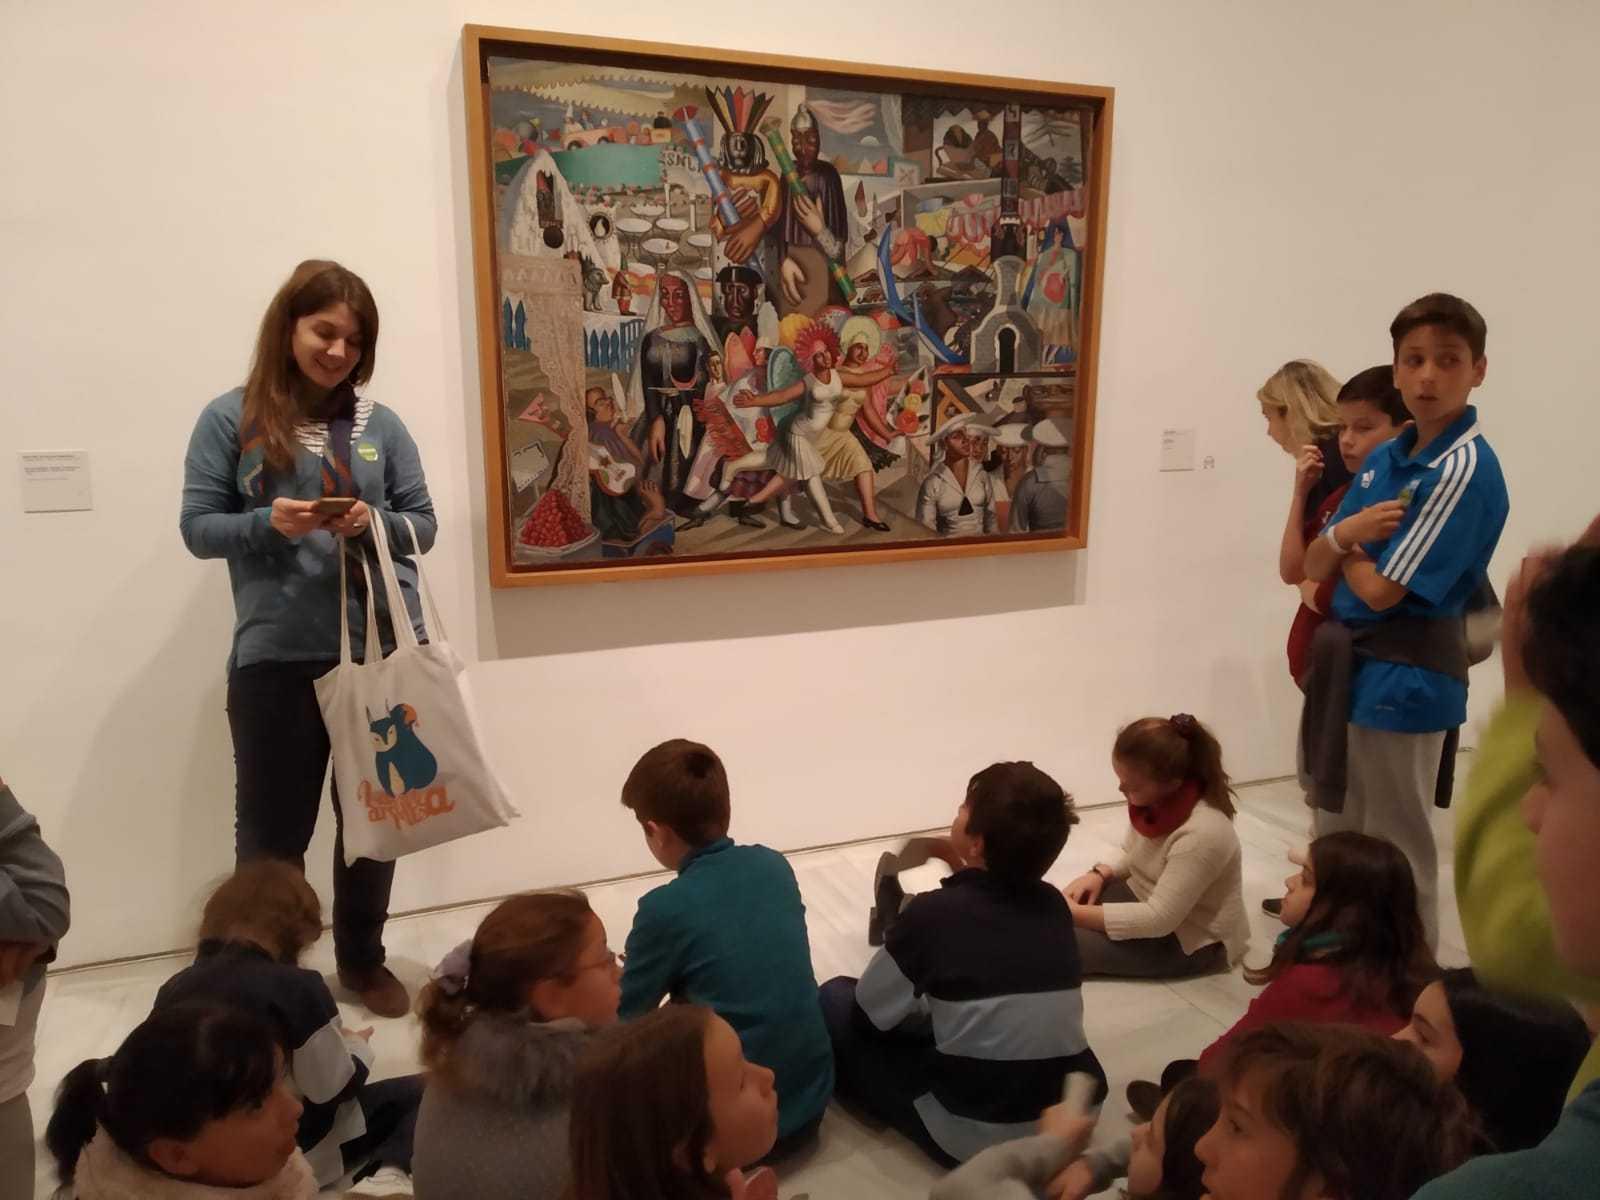 2019_02_07_Quinto visita Museo Reina Sofia_CEIP FDLR_Las Rozas 1